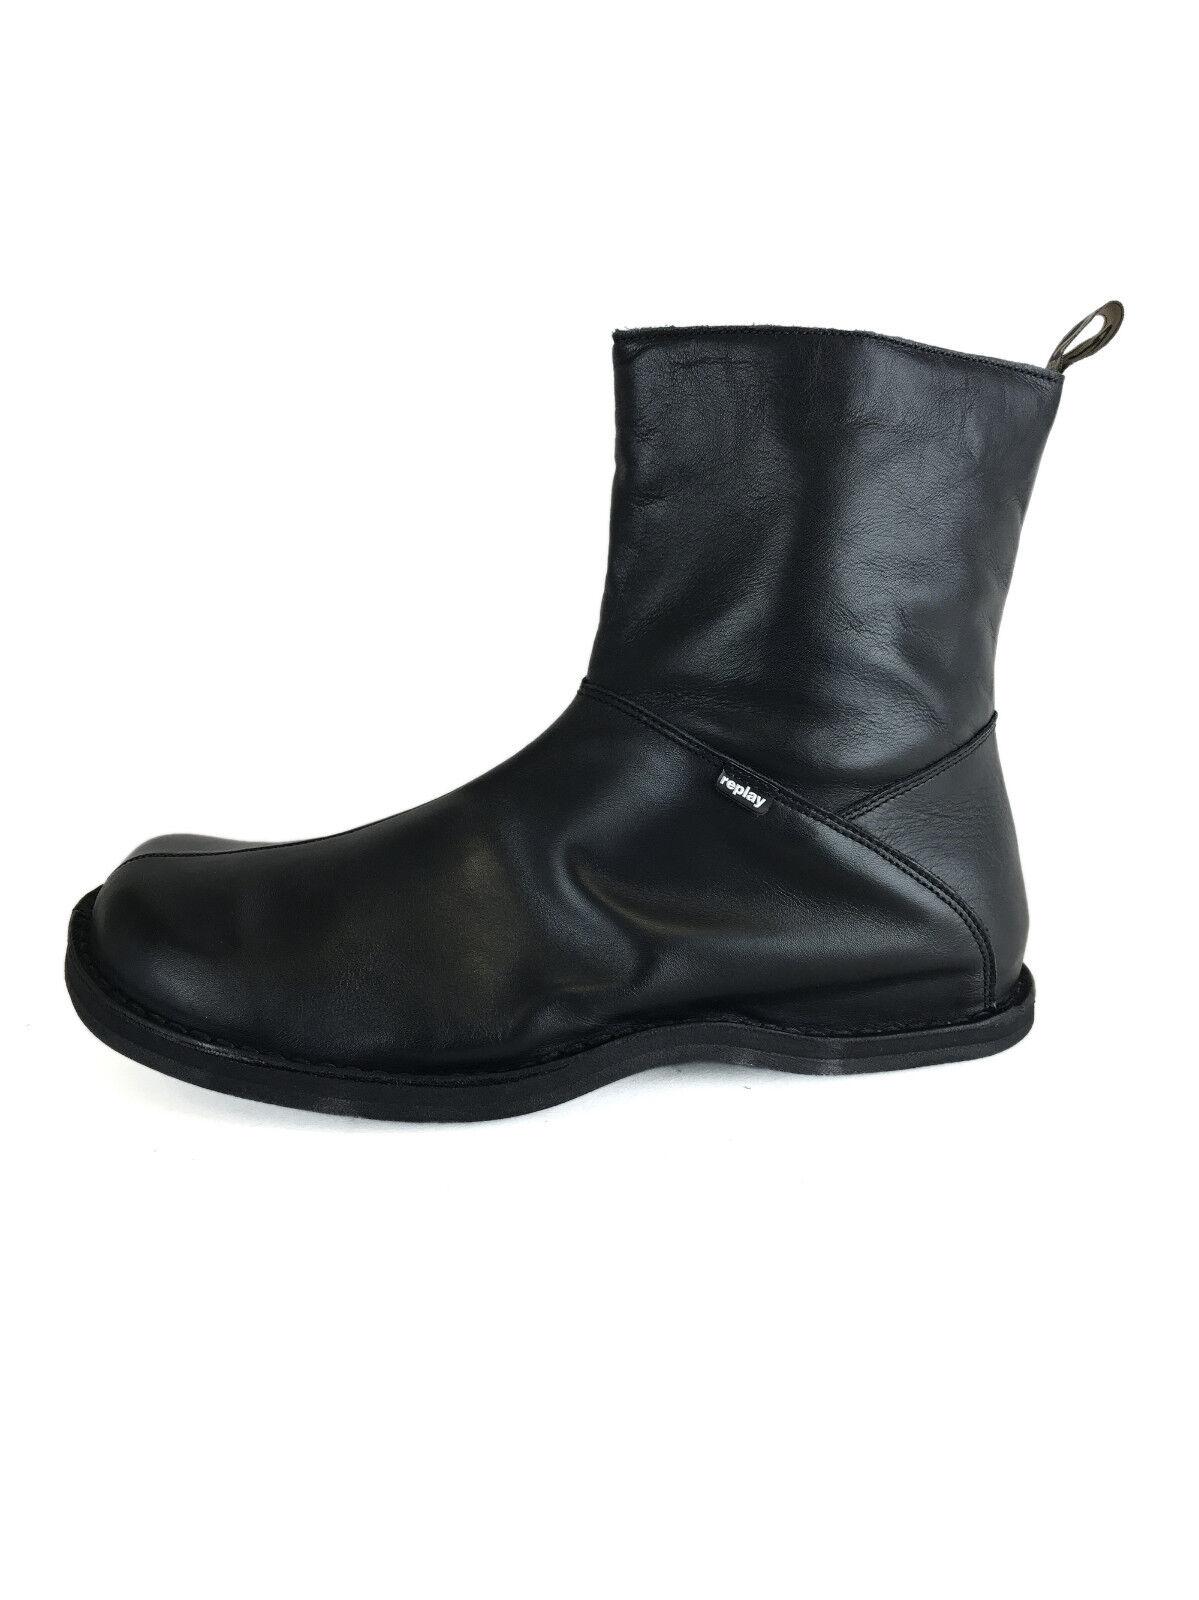 Replay GM1037 negro Vintage Men Leather mid botas